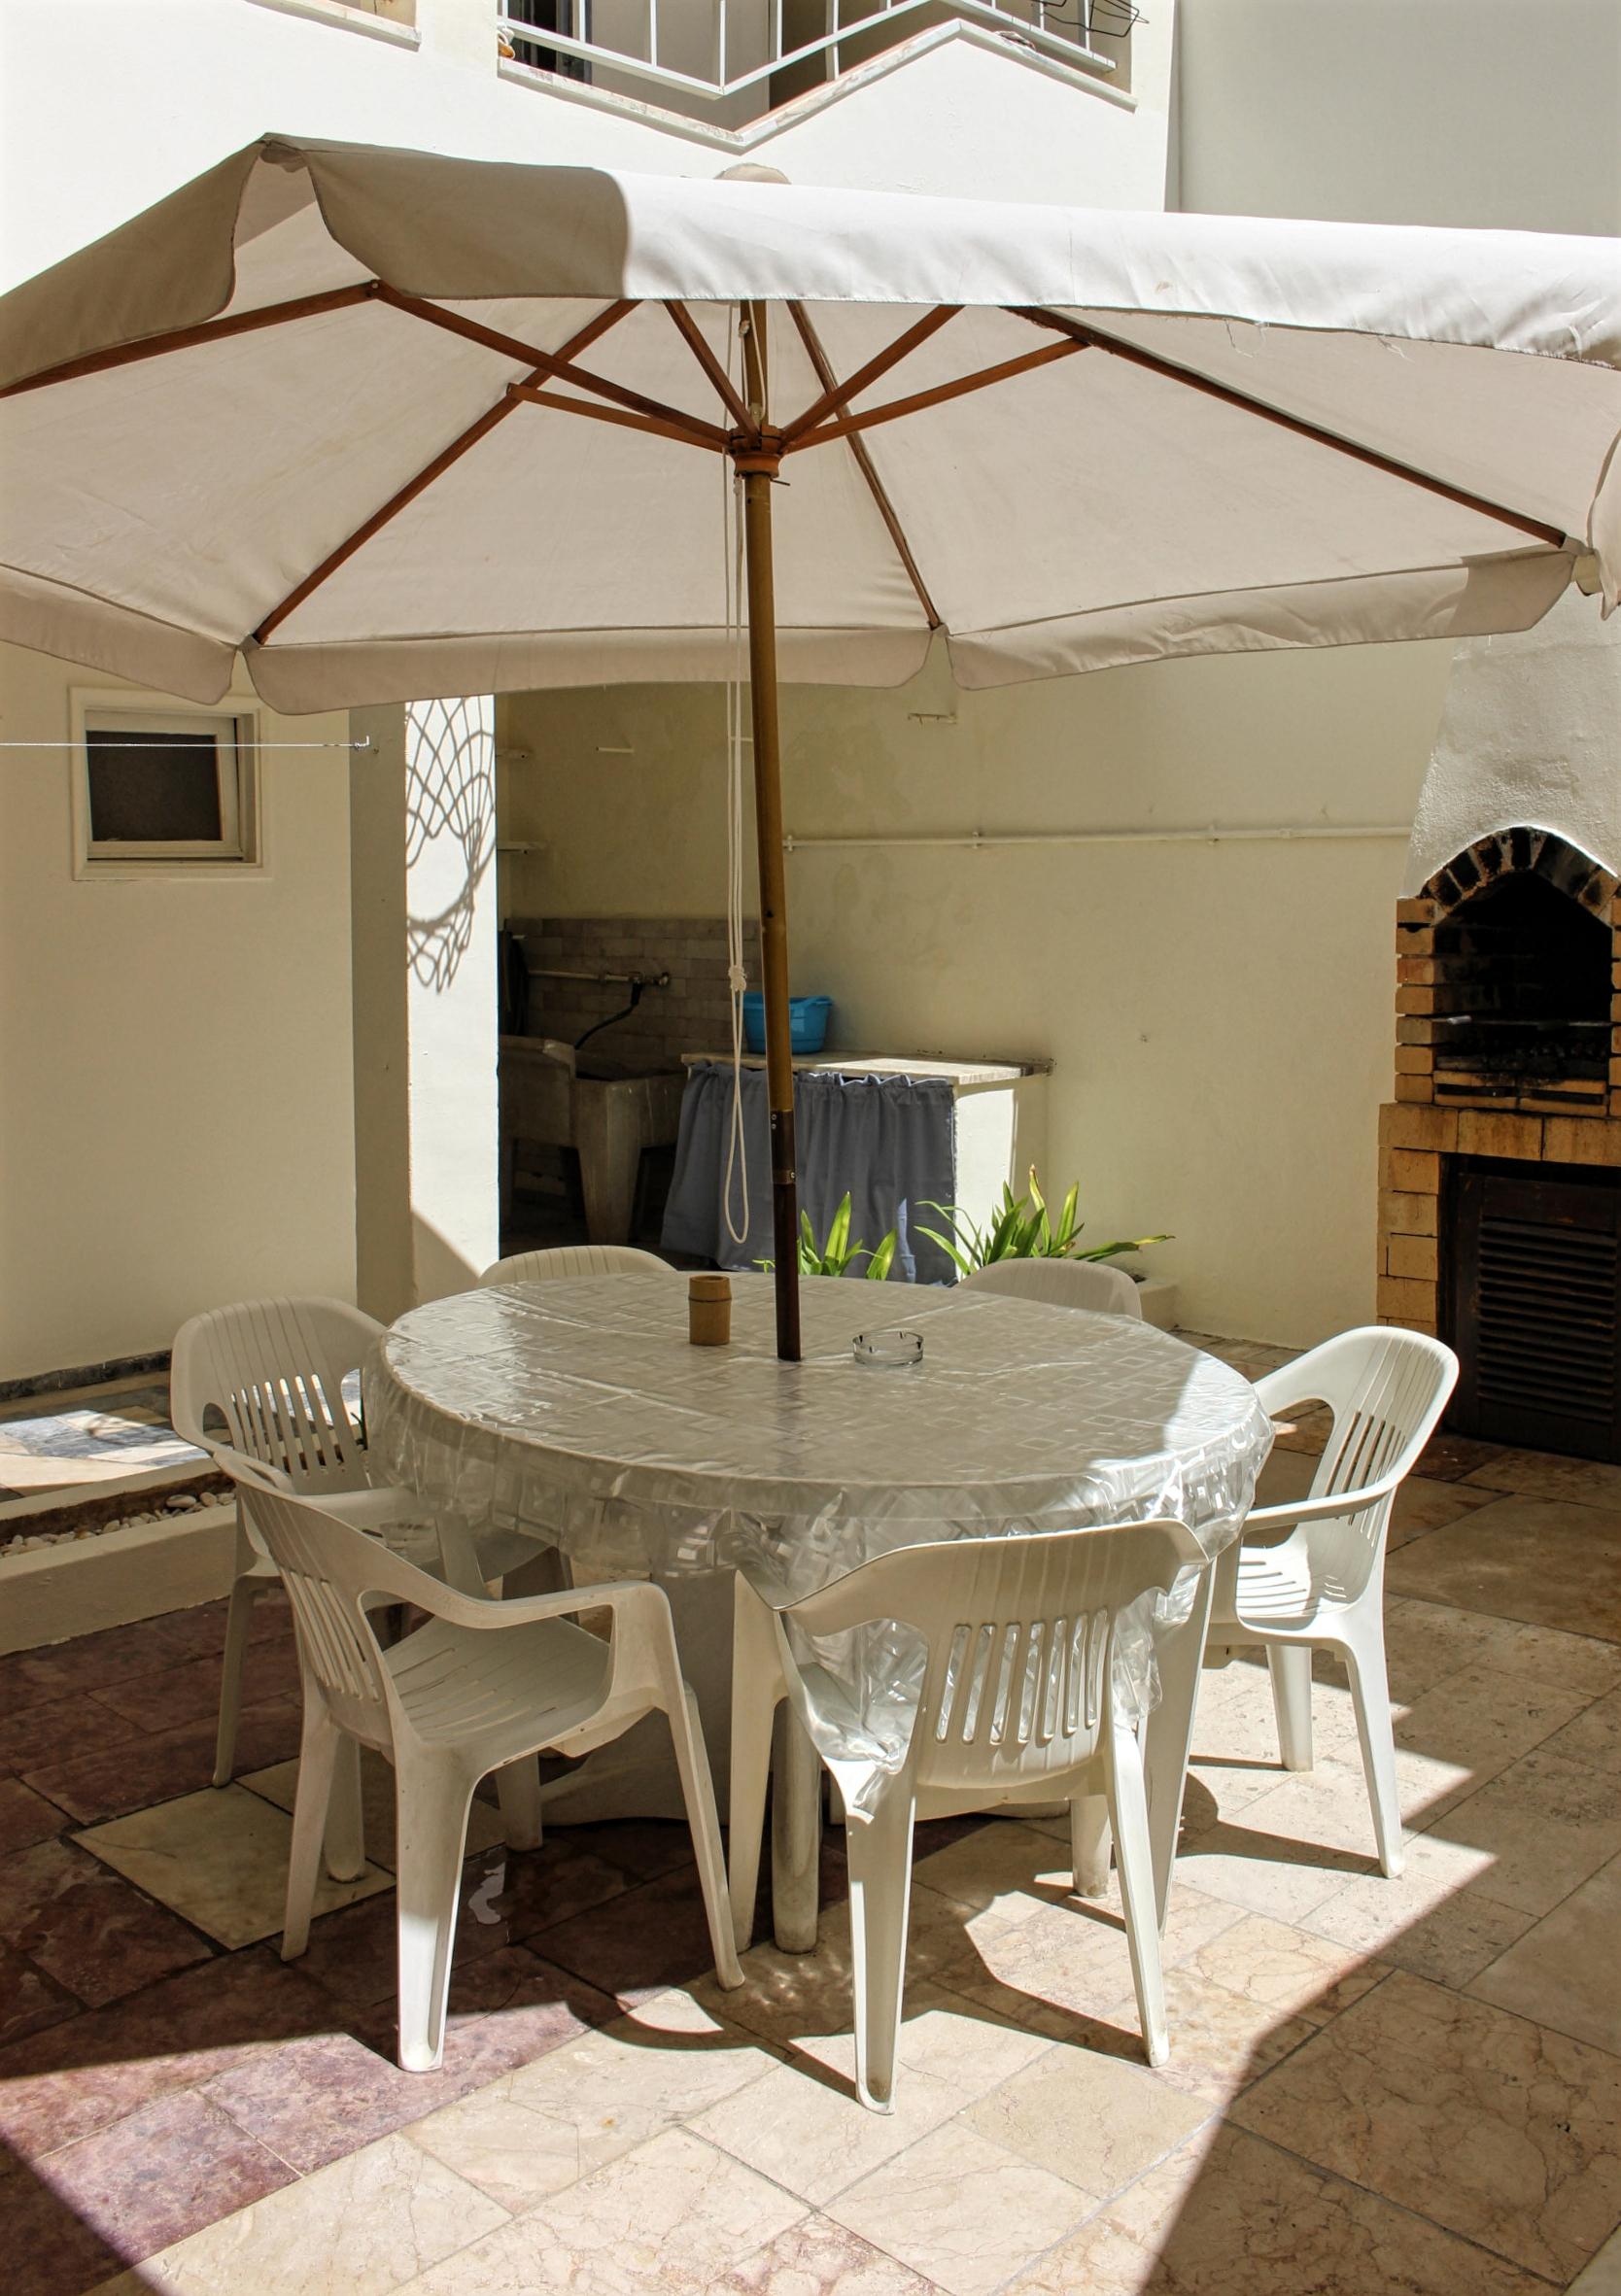 Location appartements et villas de vacance, Moradia T2 no Centro de Albufeira (Algarve) à Albufeira, Portugal Algarve, REF_IMG_3078_3087